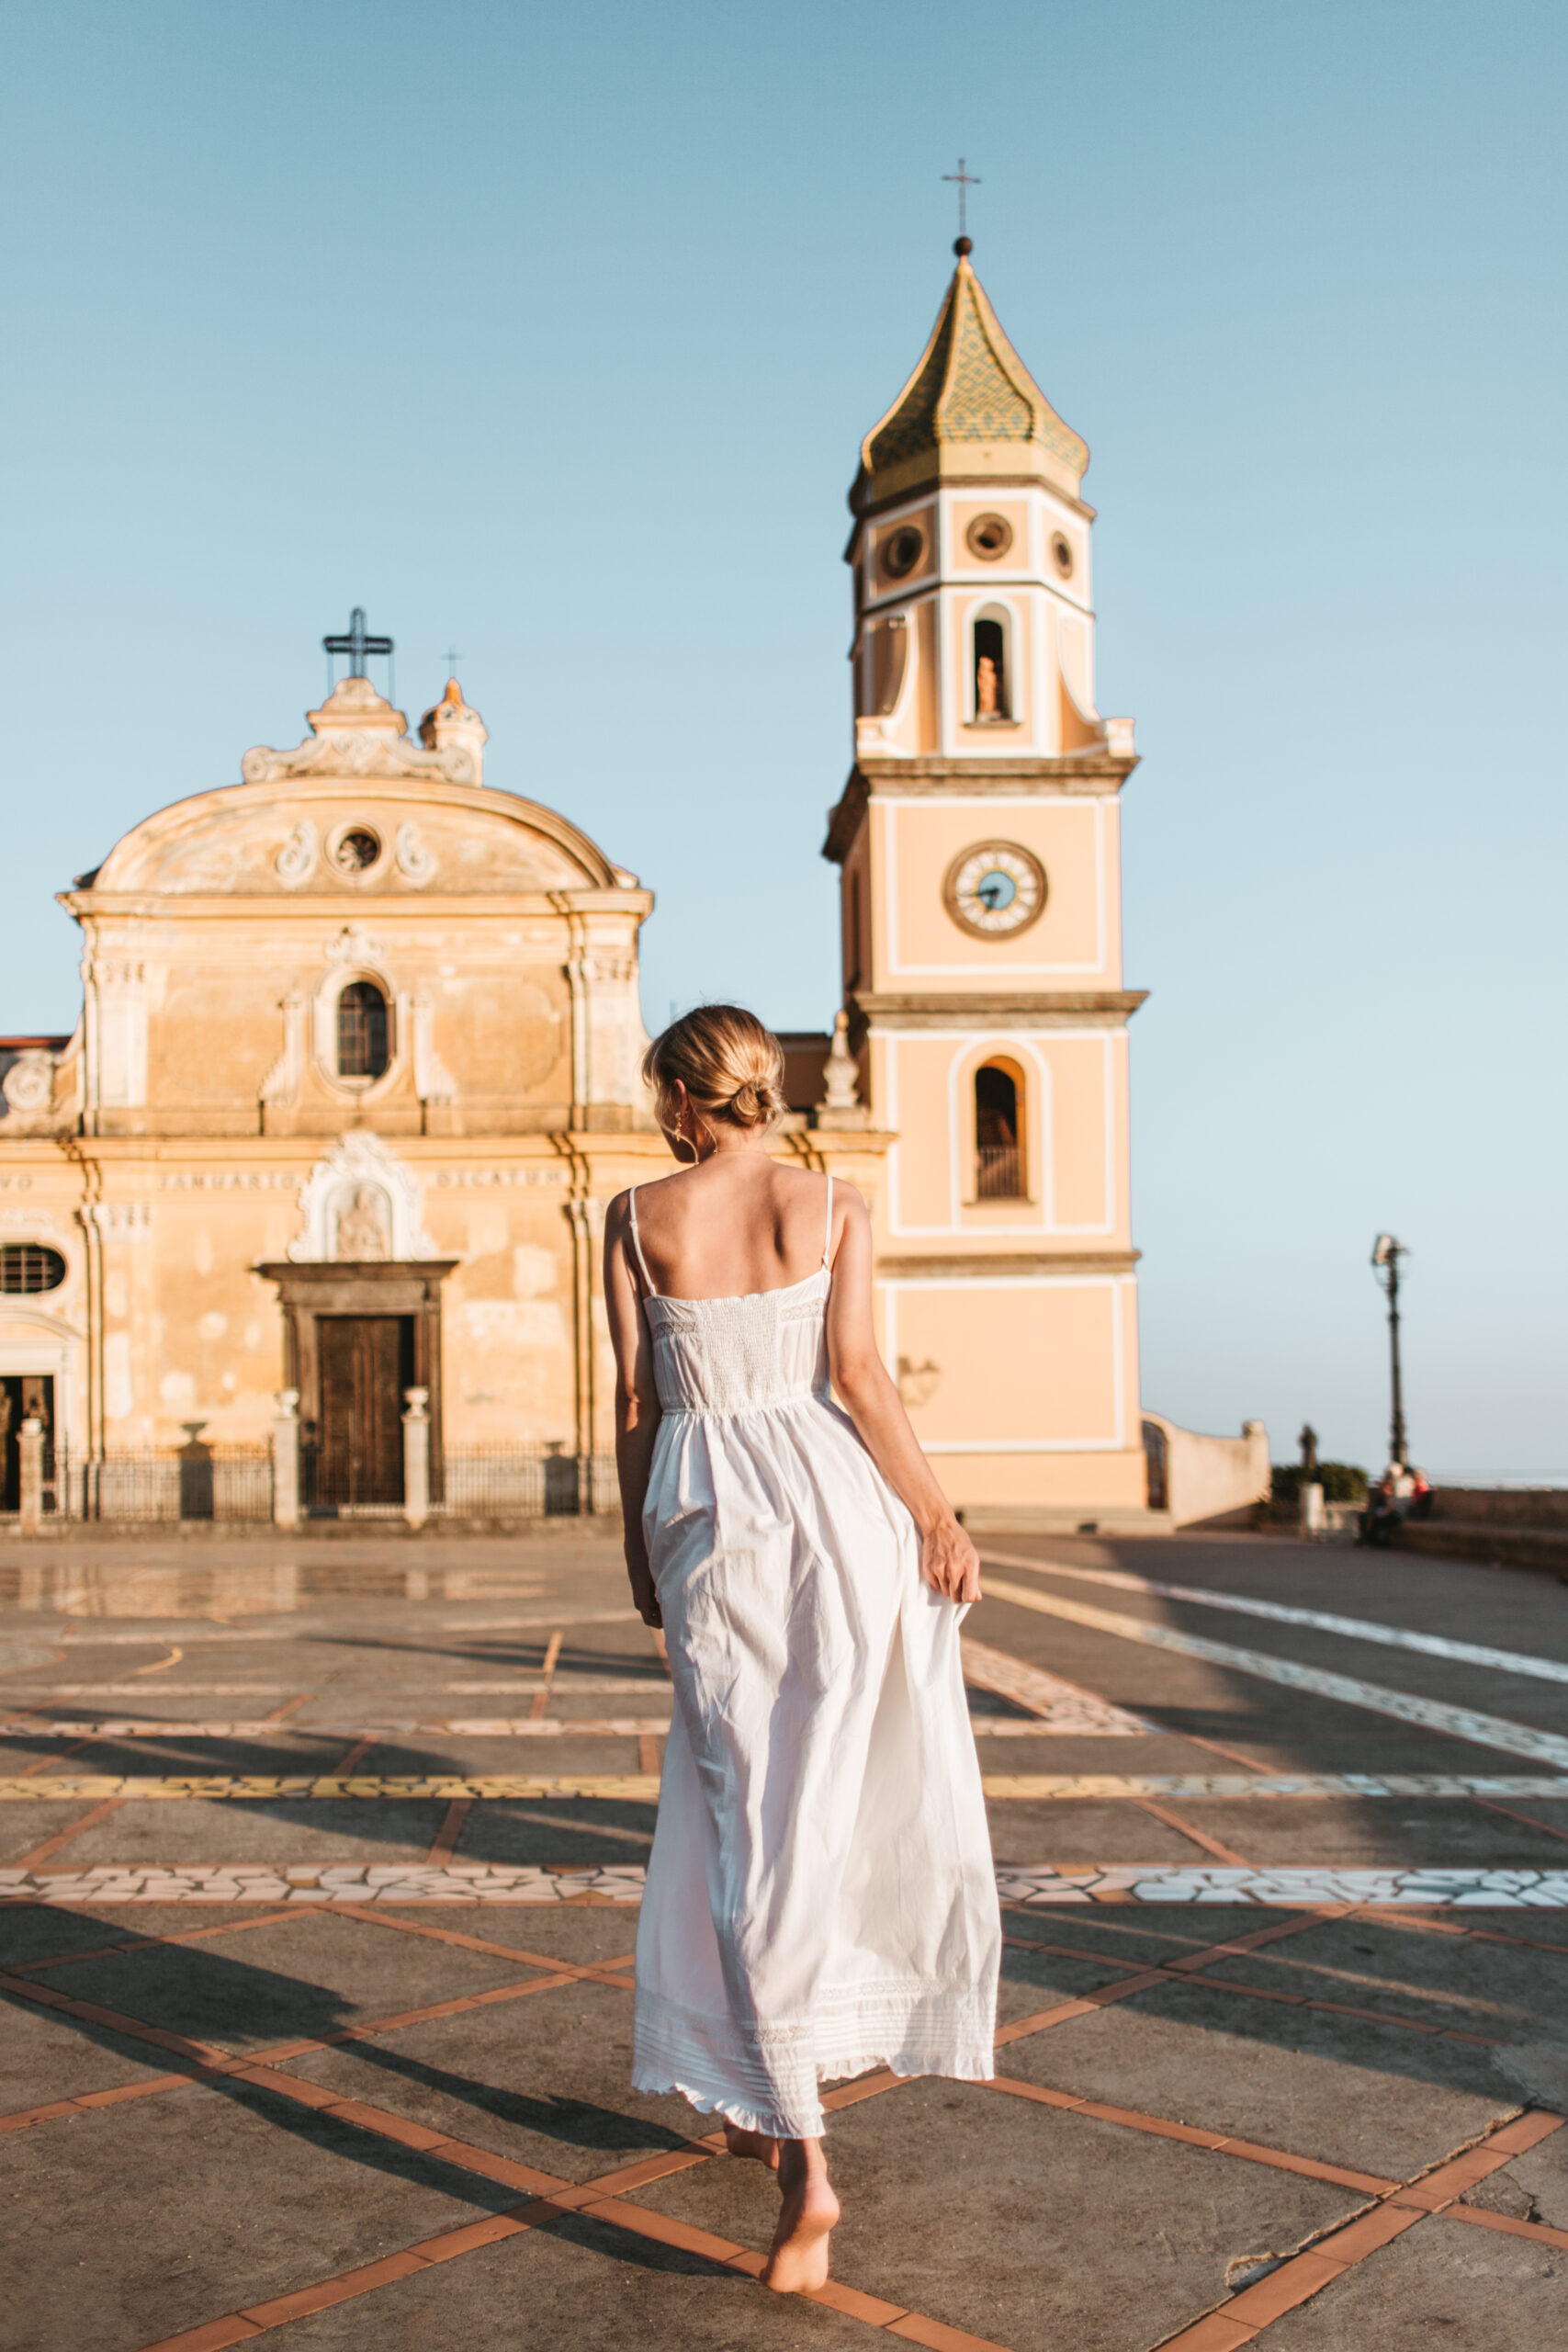 Praiano church, Positano Amalfi coast, positano co zobaczyć